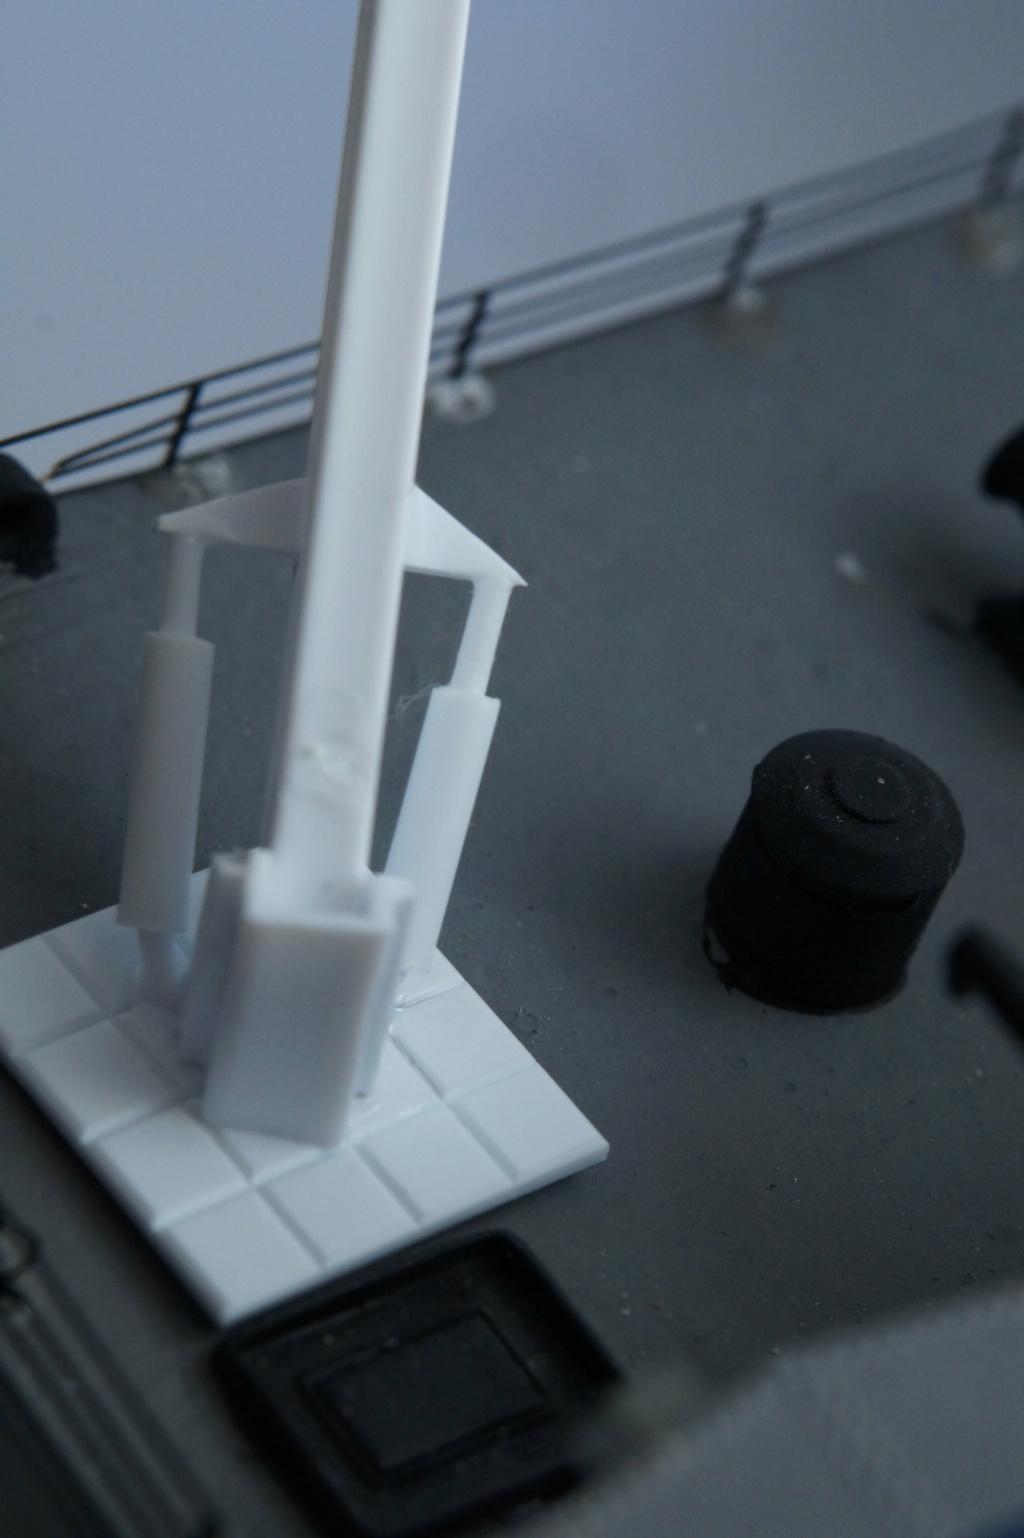 [Uchronie] USS Lake Michigan (base Iowa Trumpeter 1/200°) par hibikitokay - Page 10 Dsc00116